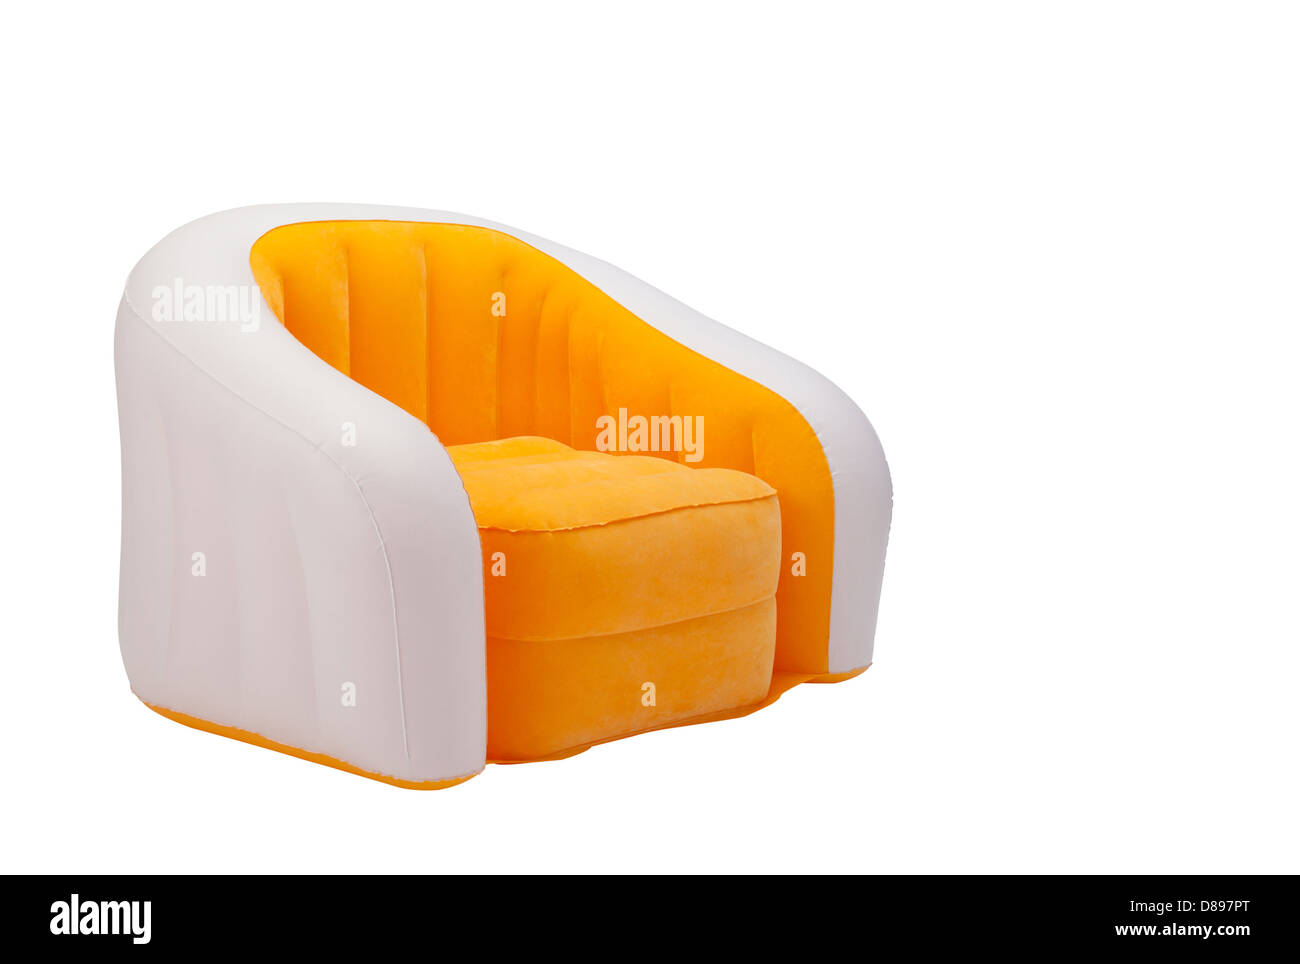 Color naranja hinchable sillón aislado sobre fondo blanco. Imagen De Stock